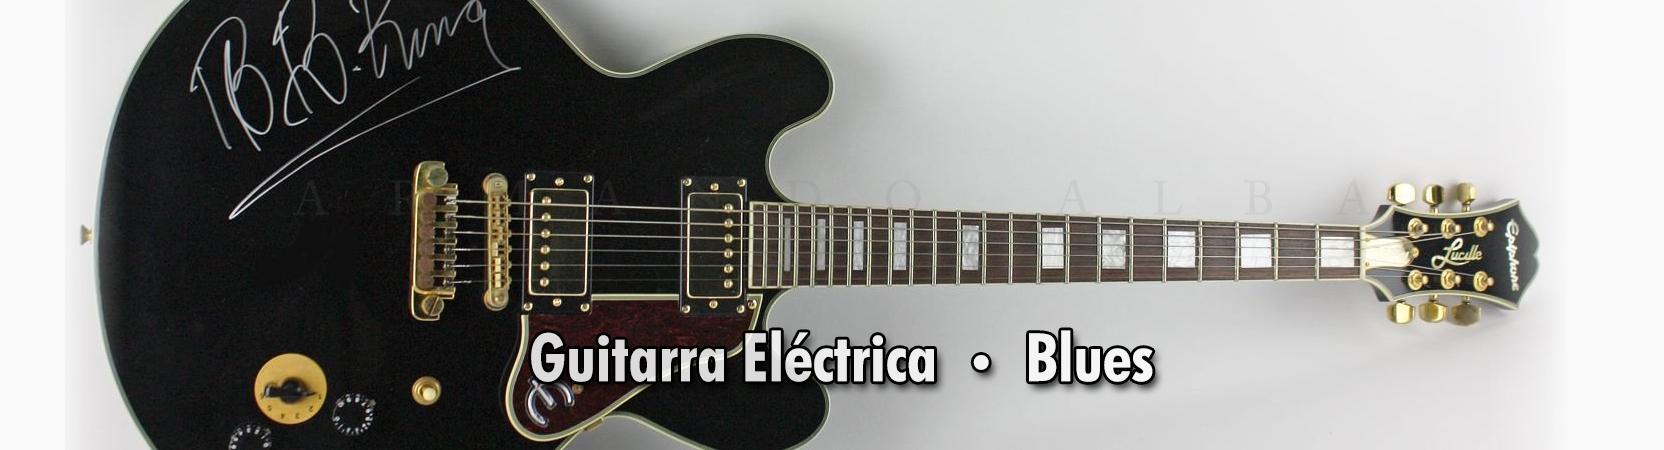 Imagen_para_página_Wix_-_guitarra_electrica_blues_01-1_(1664x450px)